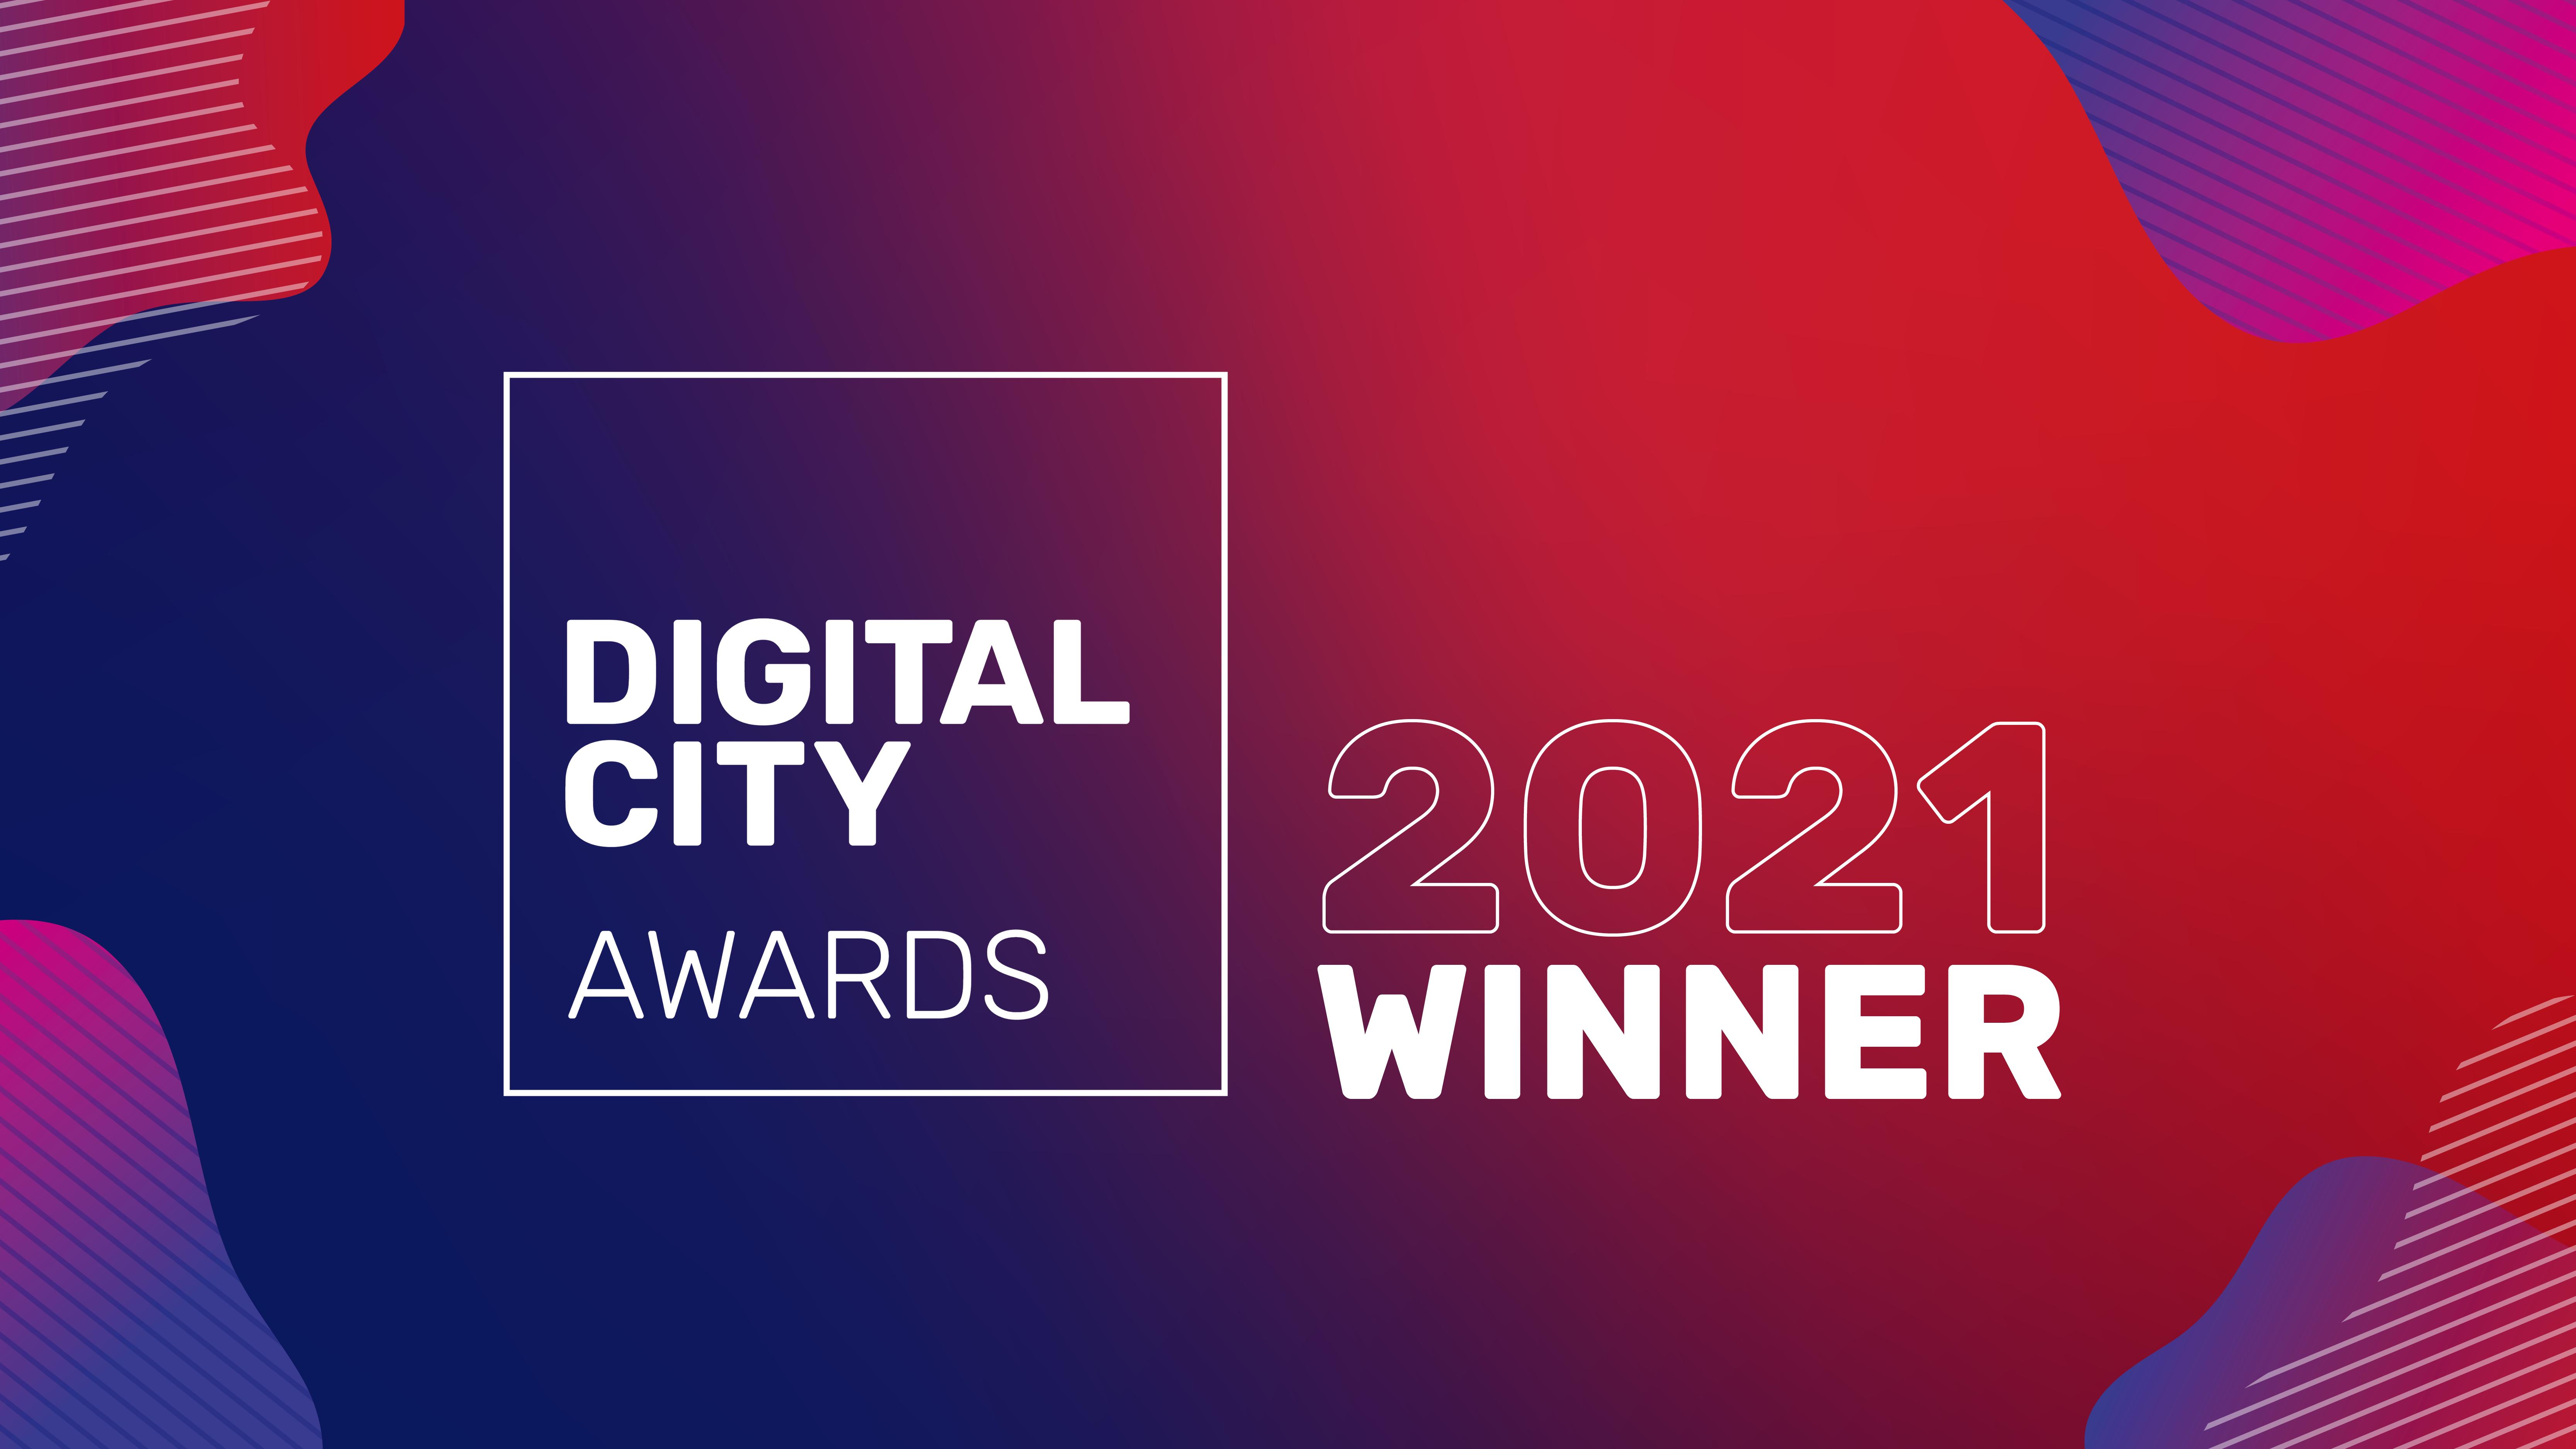 Digital City Awards 2021